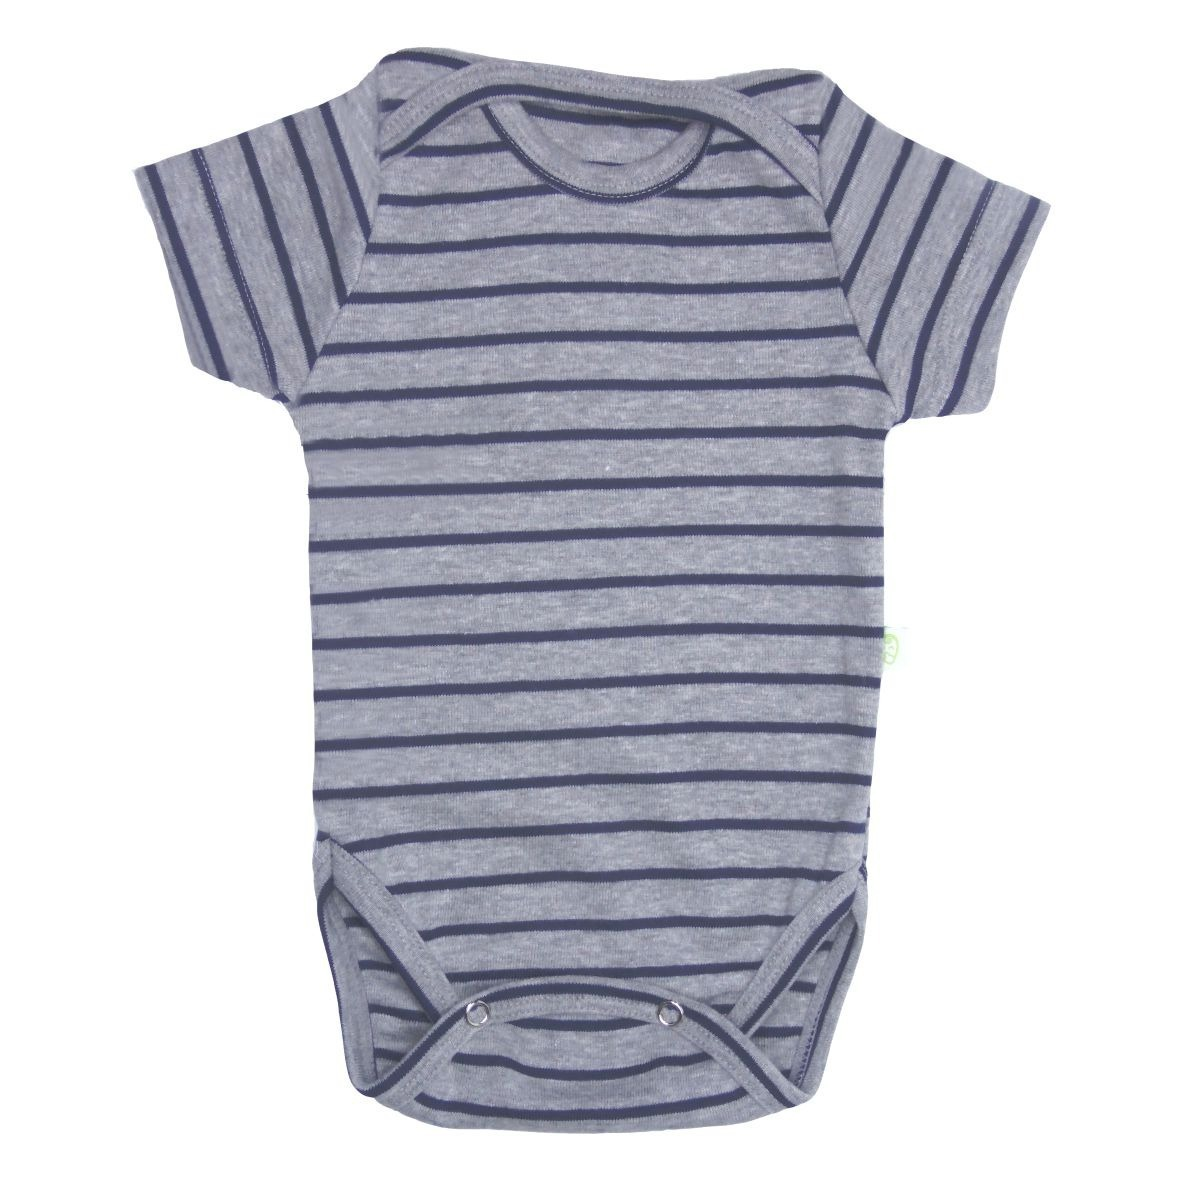 06d69b955 kit body liso bebê estampado 5 peças colorido menino menina. Carregando  zoom.